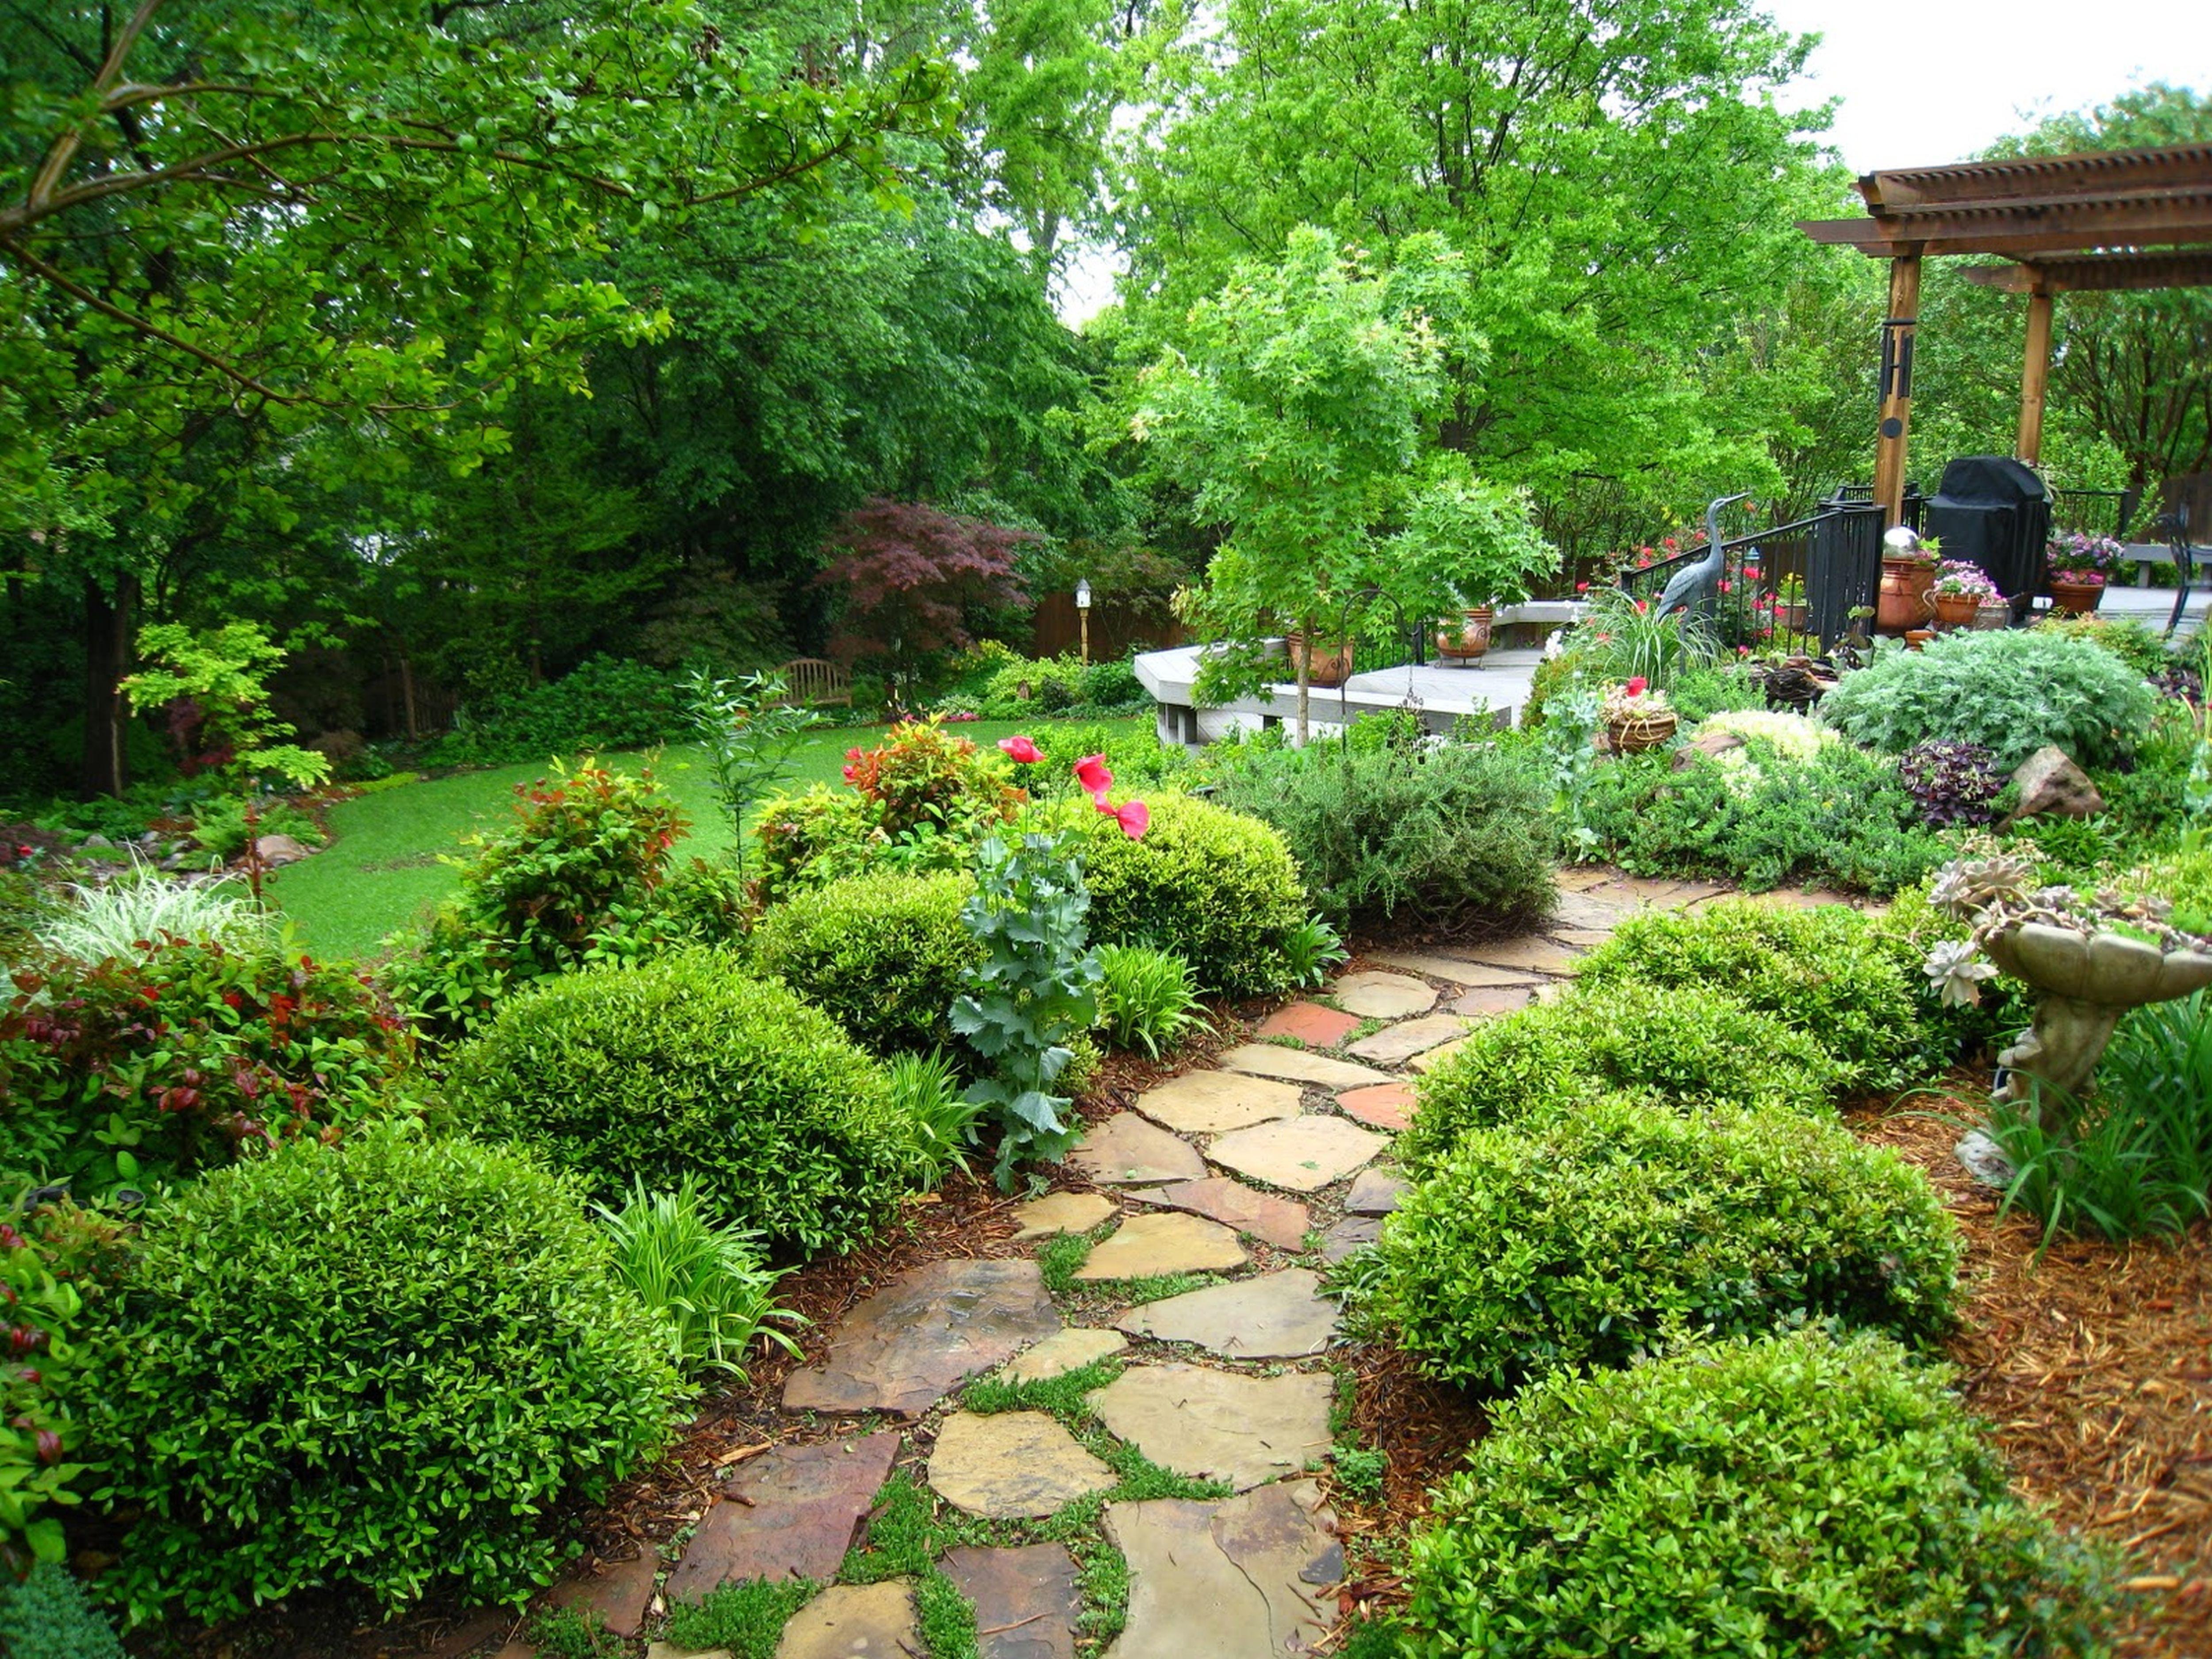 Httpcdnlapprcomimagesgardenideasxbackyard - Backyard gardens ideas